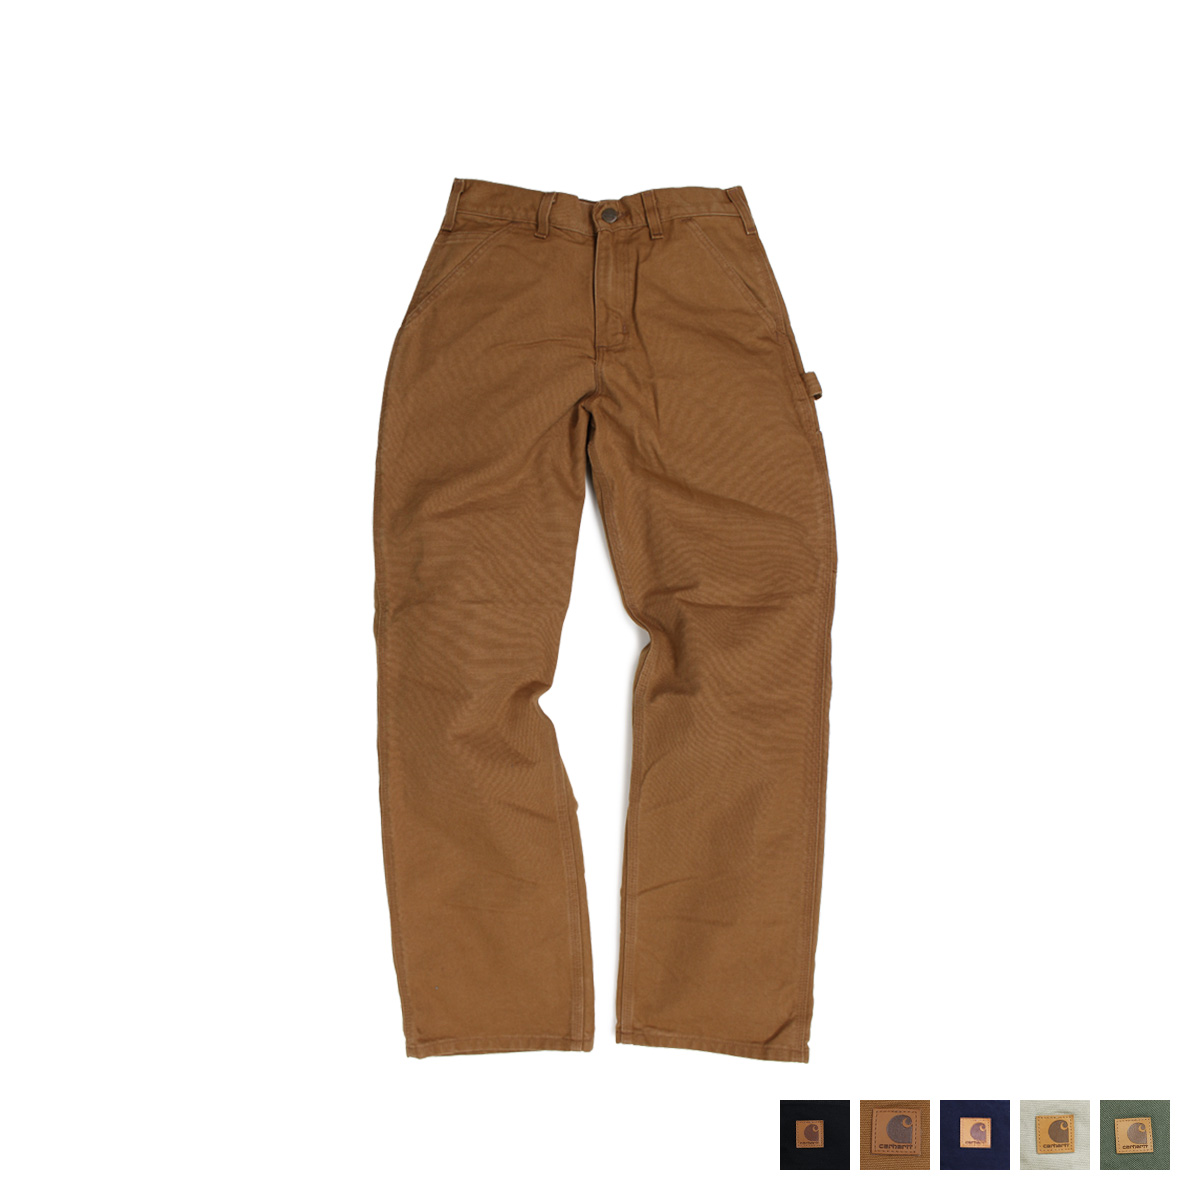 c8f1b39402 carhartt WASHED DUCK WORK DUNGAREE car heart underwear work pants painter  underwear men B11 [the ...